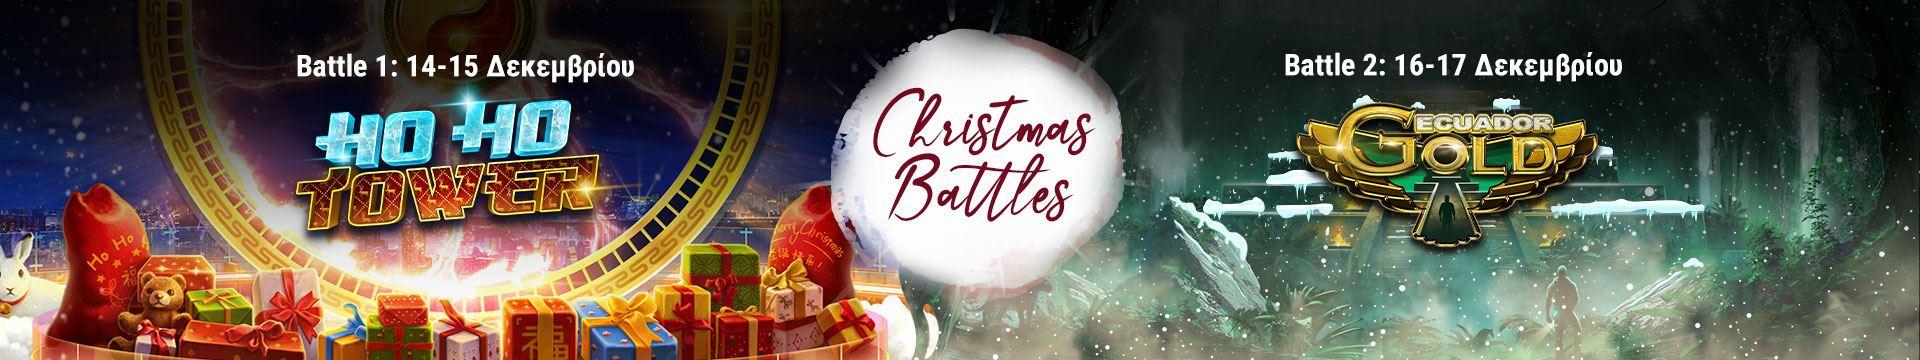 Christmas_Battles